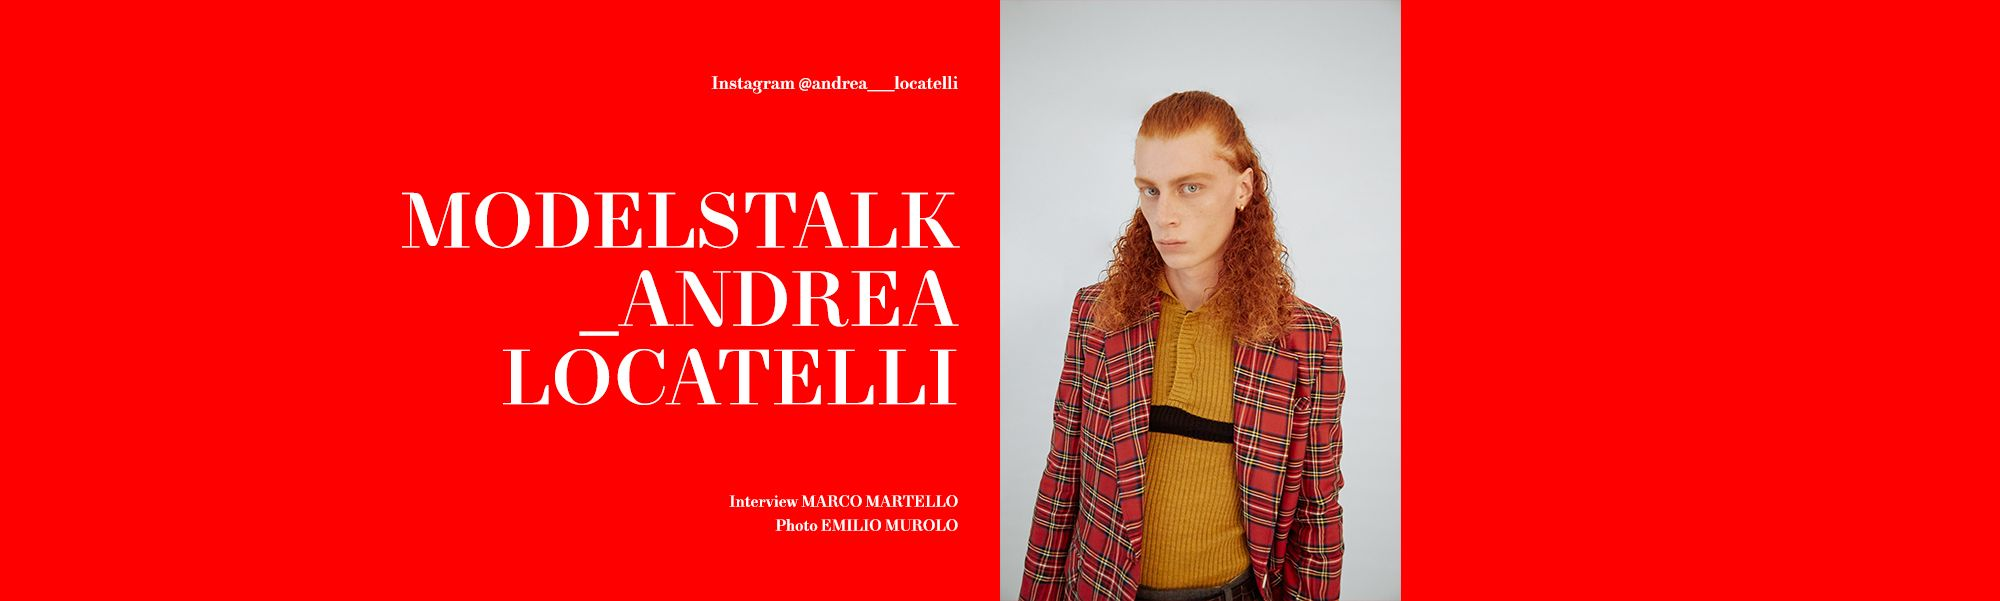 andrea-locatelli-thegreatestmagazine-banner